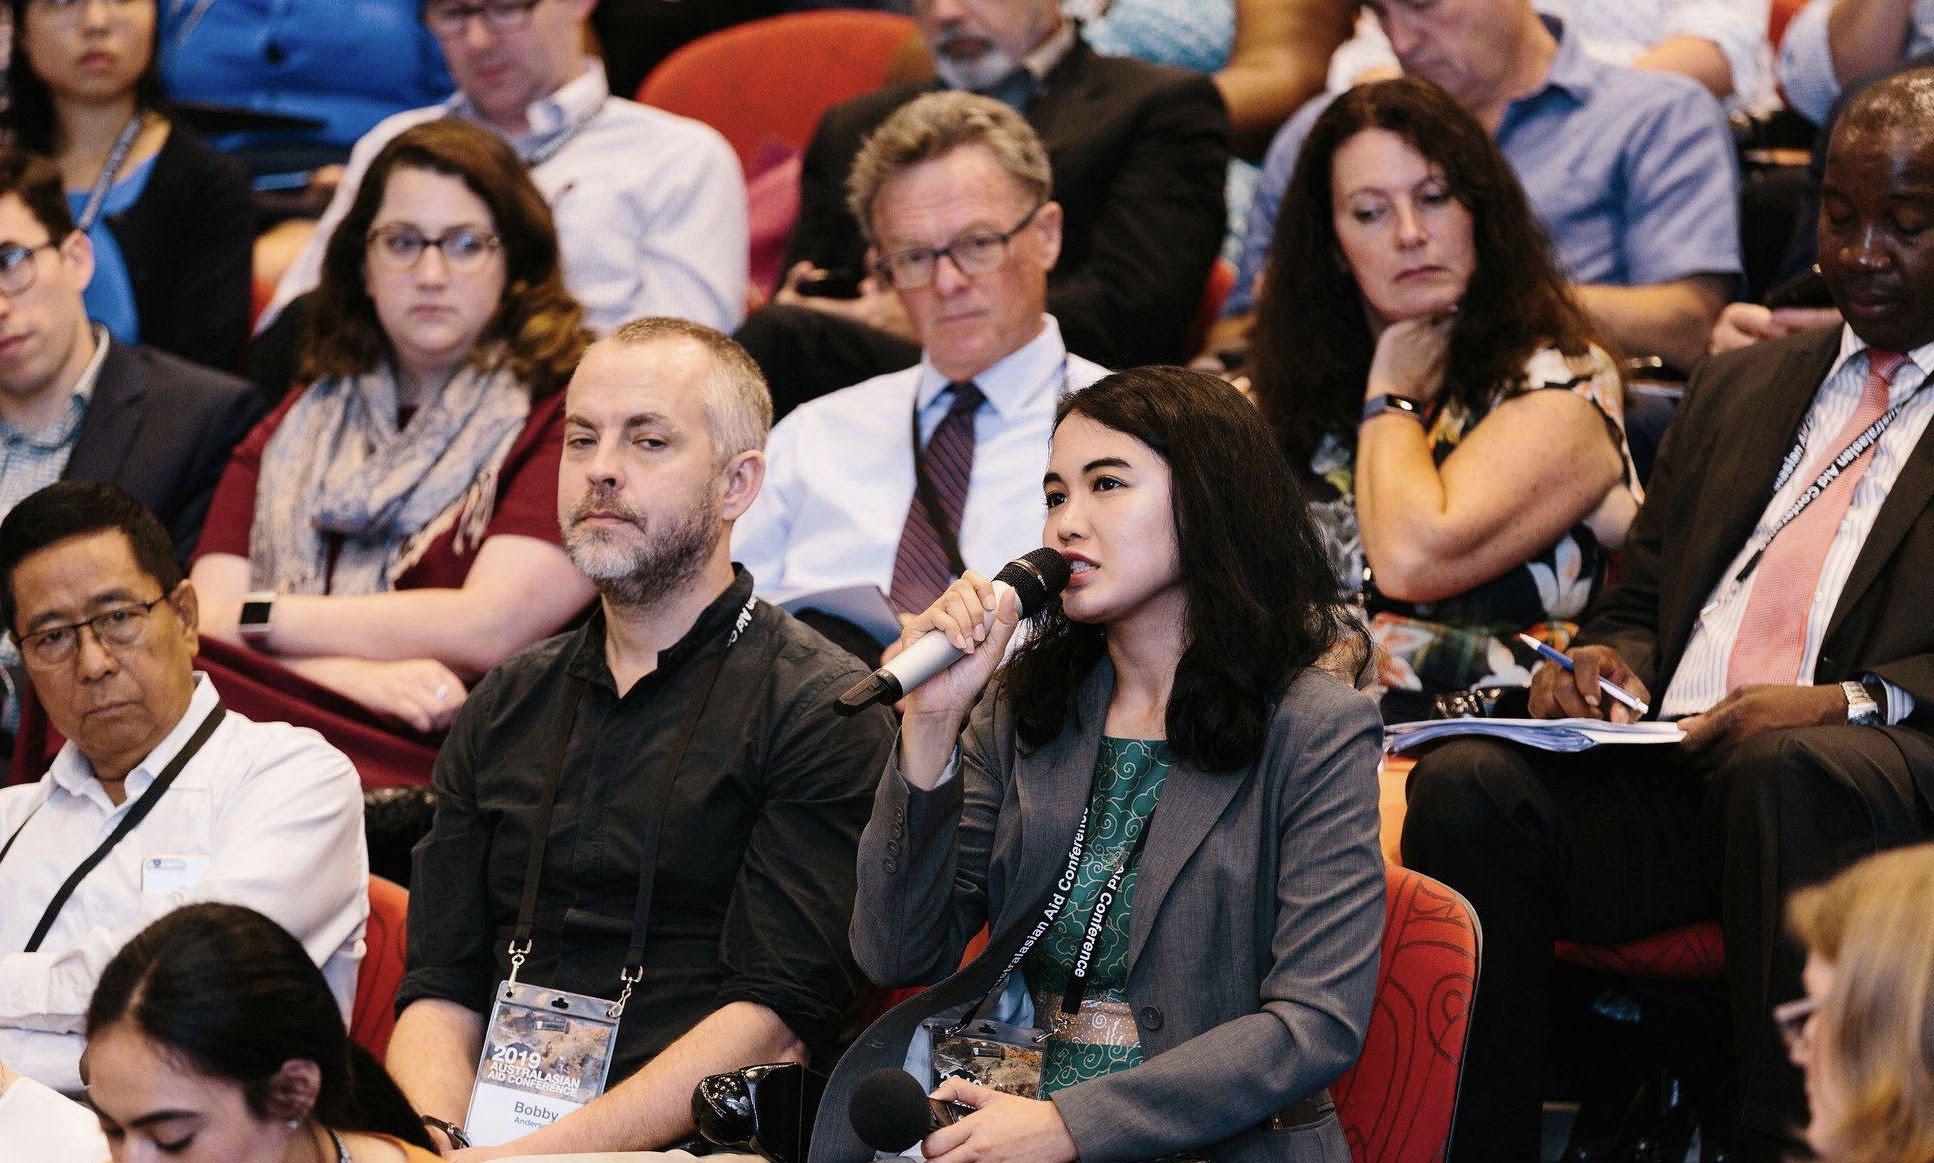 Gracia bertanya dan berpartisipasi aktif dalam sesi Plenary Hall di Australasian Aid Conference, 18 Februari 2019 di Australian National University